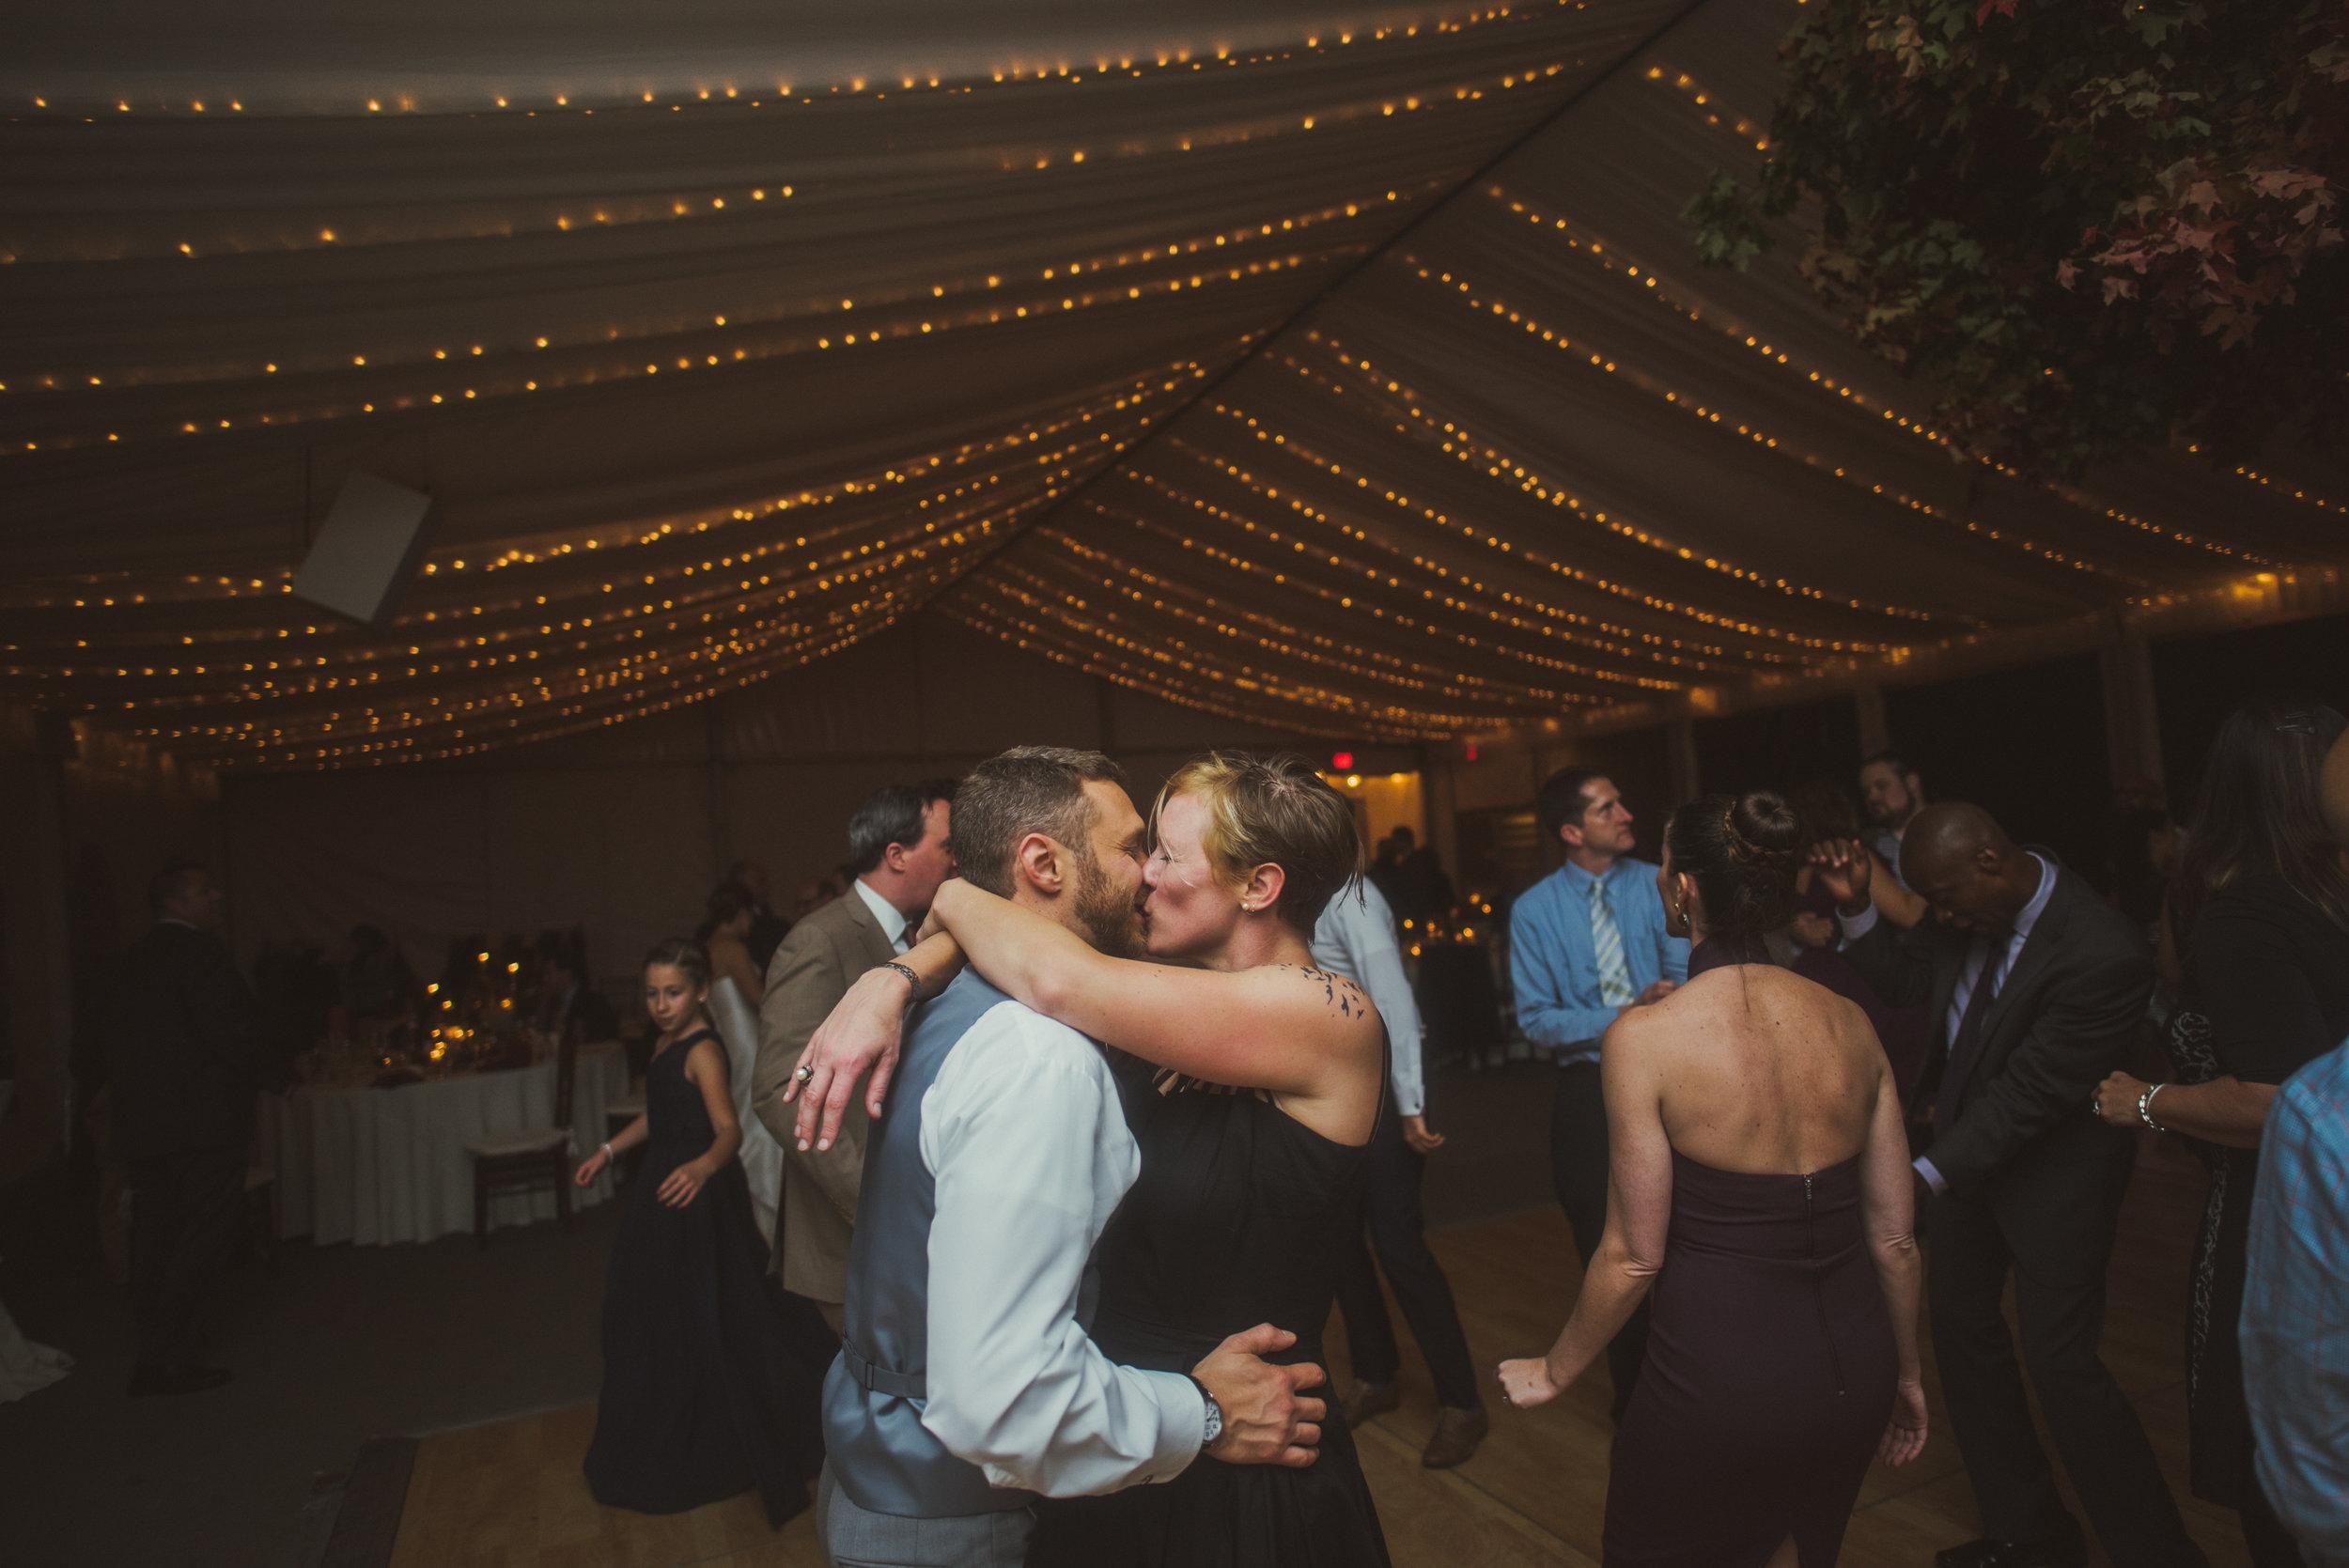 JACQUELINE & ANDREW WARSHAWER -BROOKMILL FARM FALL WEDDING - INTIMATE WEDDING PHOTOGRAPHER - TWOTWENTY by CHI-CHI AGBIM-719.jpg